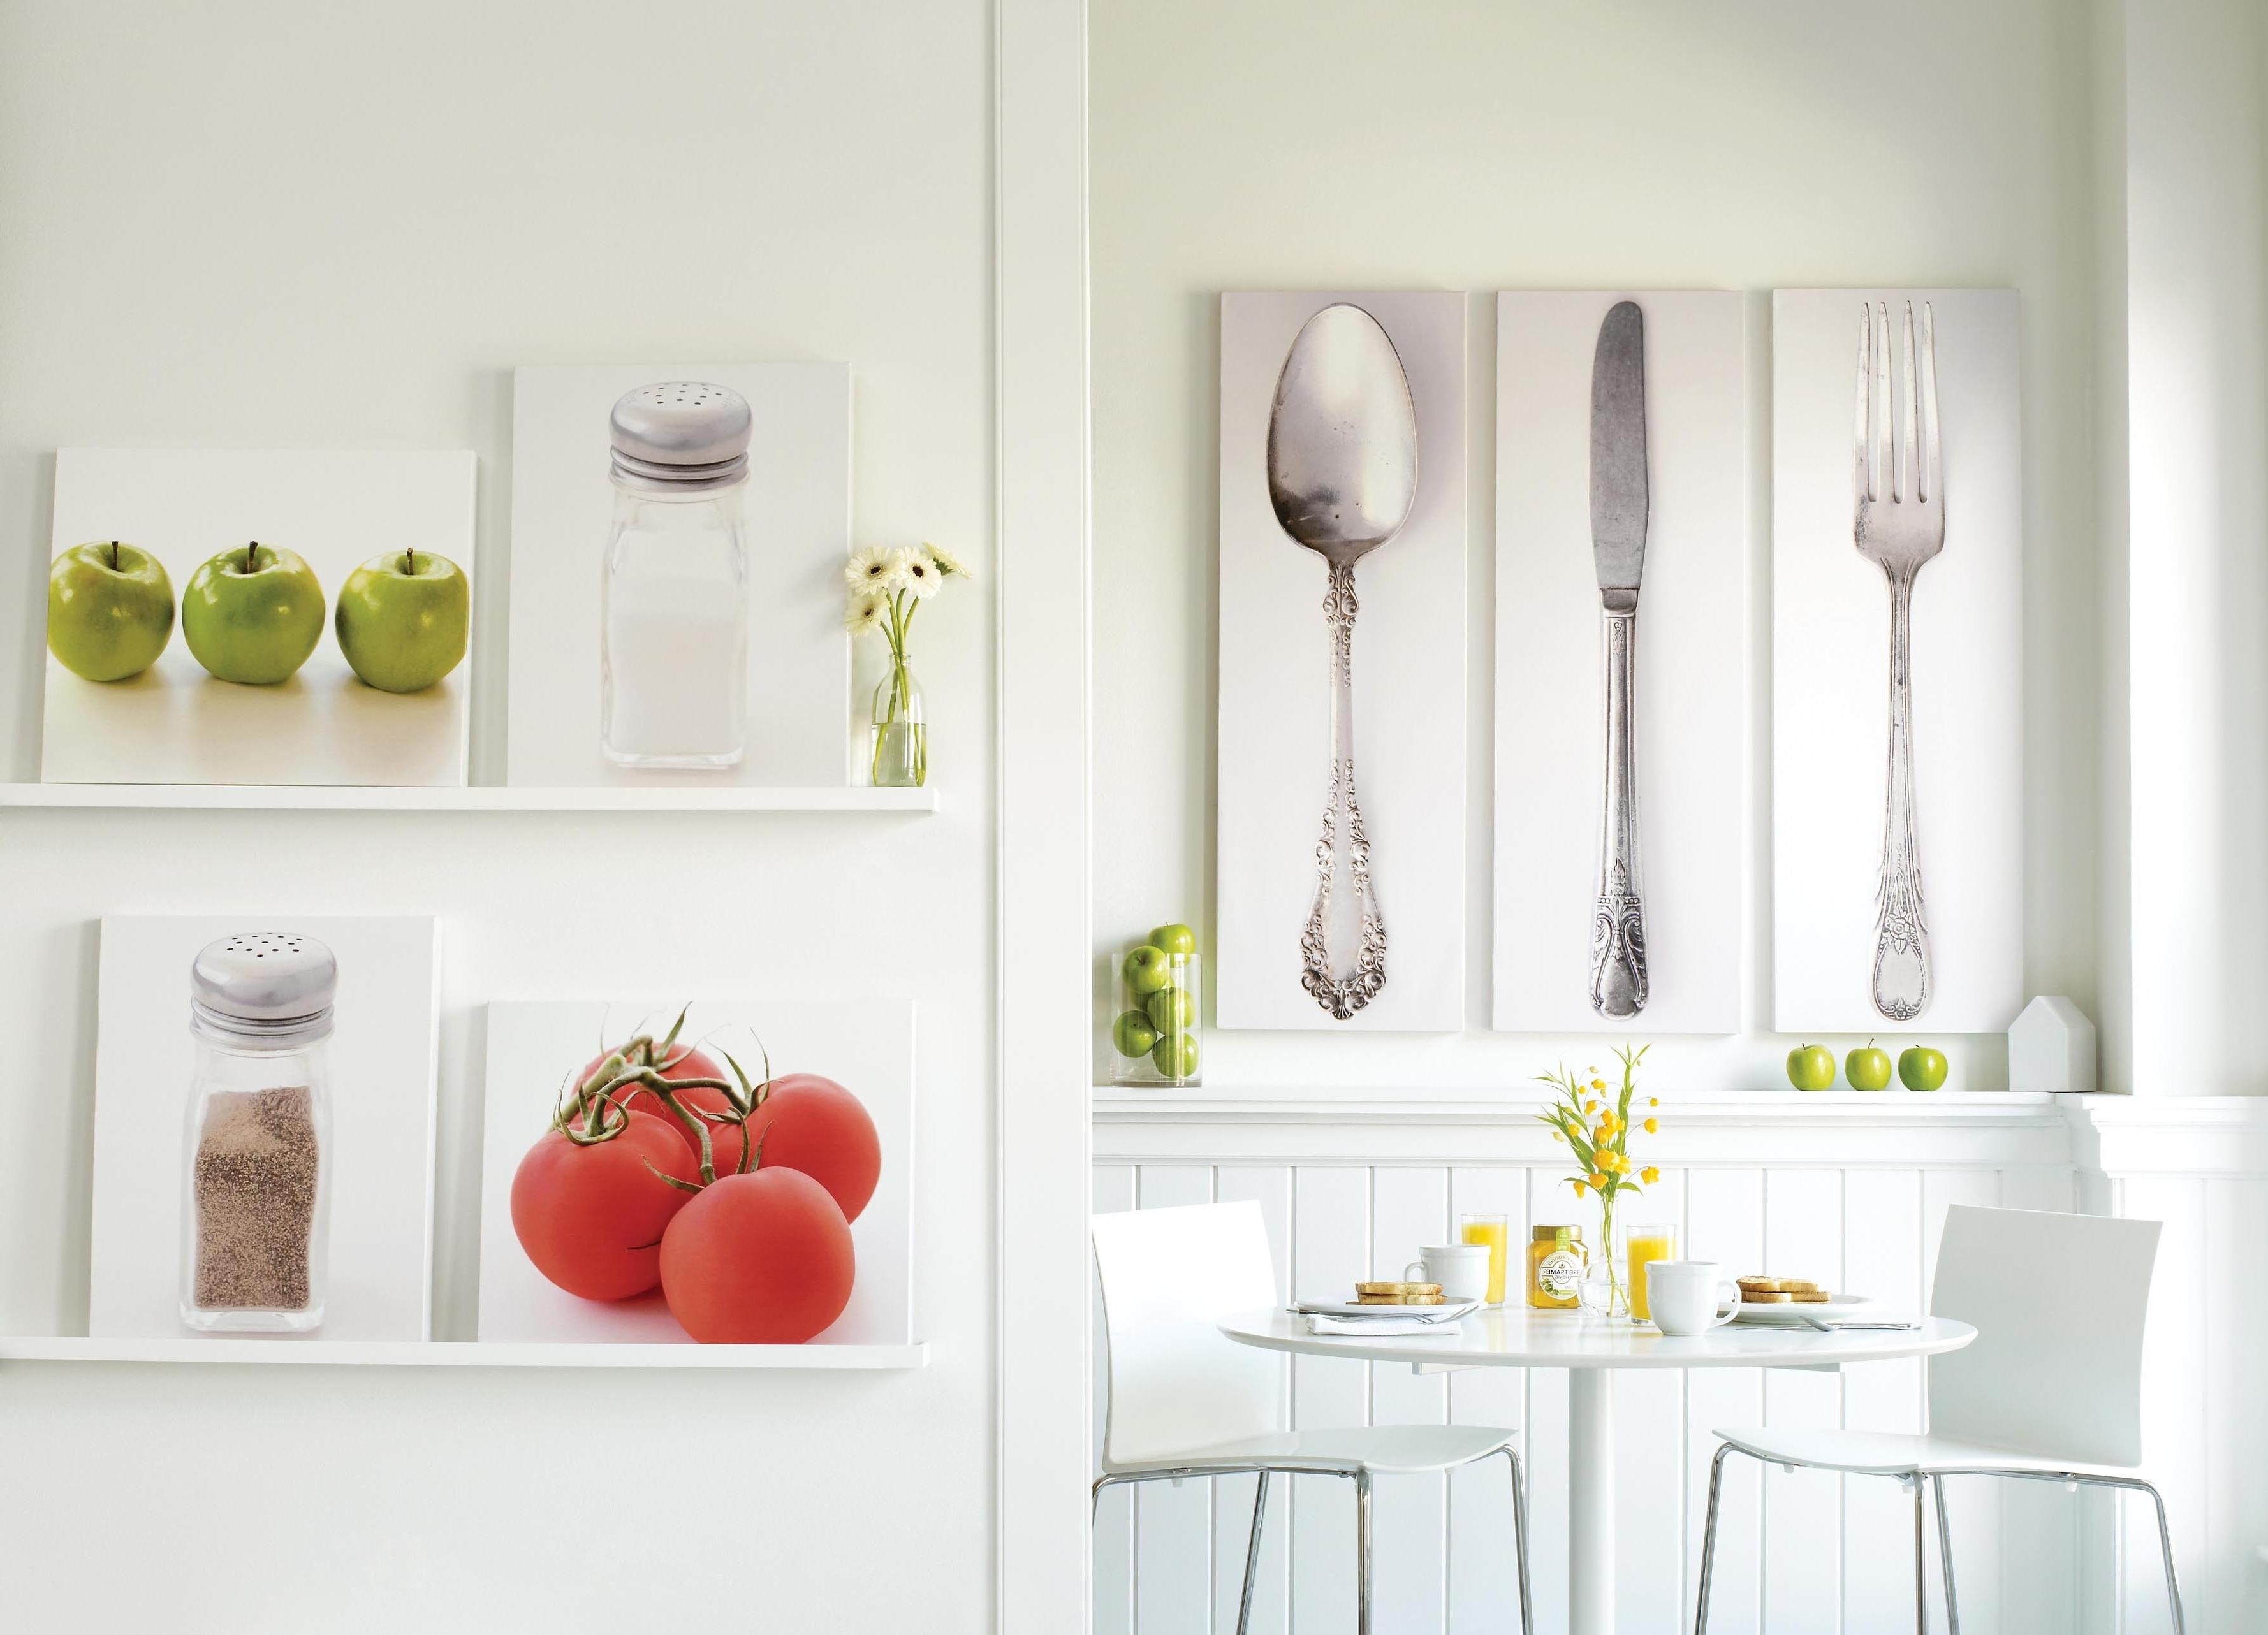 Kitchen : Large Wall Art Large Kitchen Wall Art Kitchen Wall Art For Favorite Wall Art For Kitchens (Gallery 10 of 15)